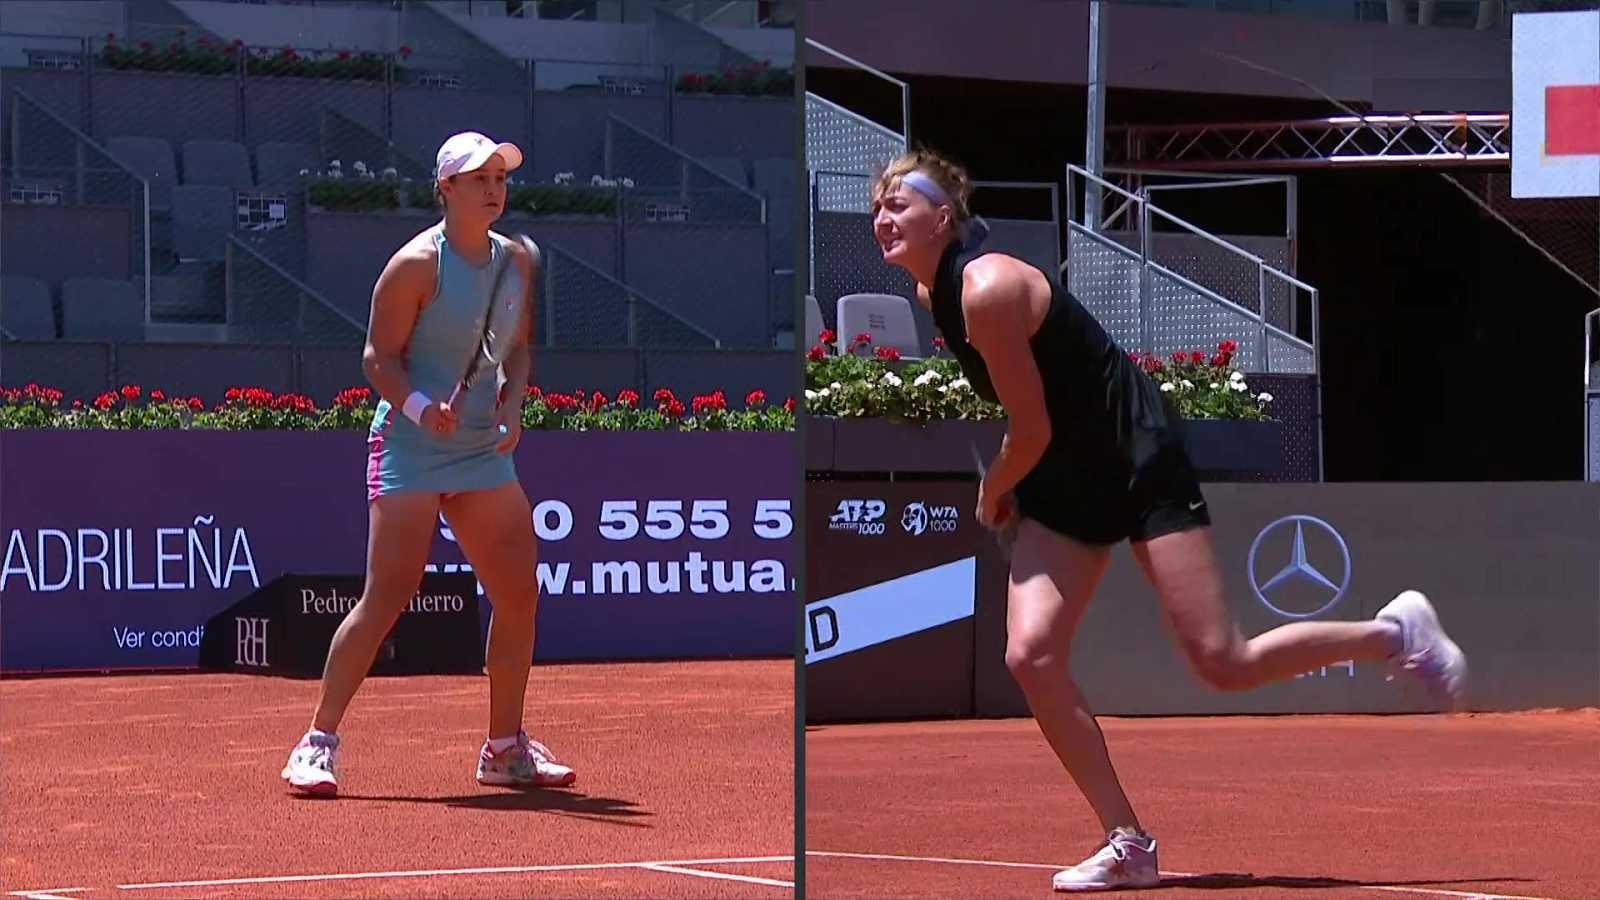 Tenis - WTA Mutua Madrid Open: Ashleigh Barty - Petra Kvitova - ver ahora